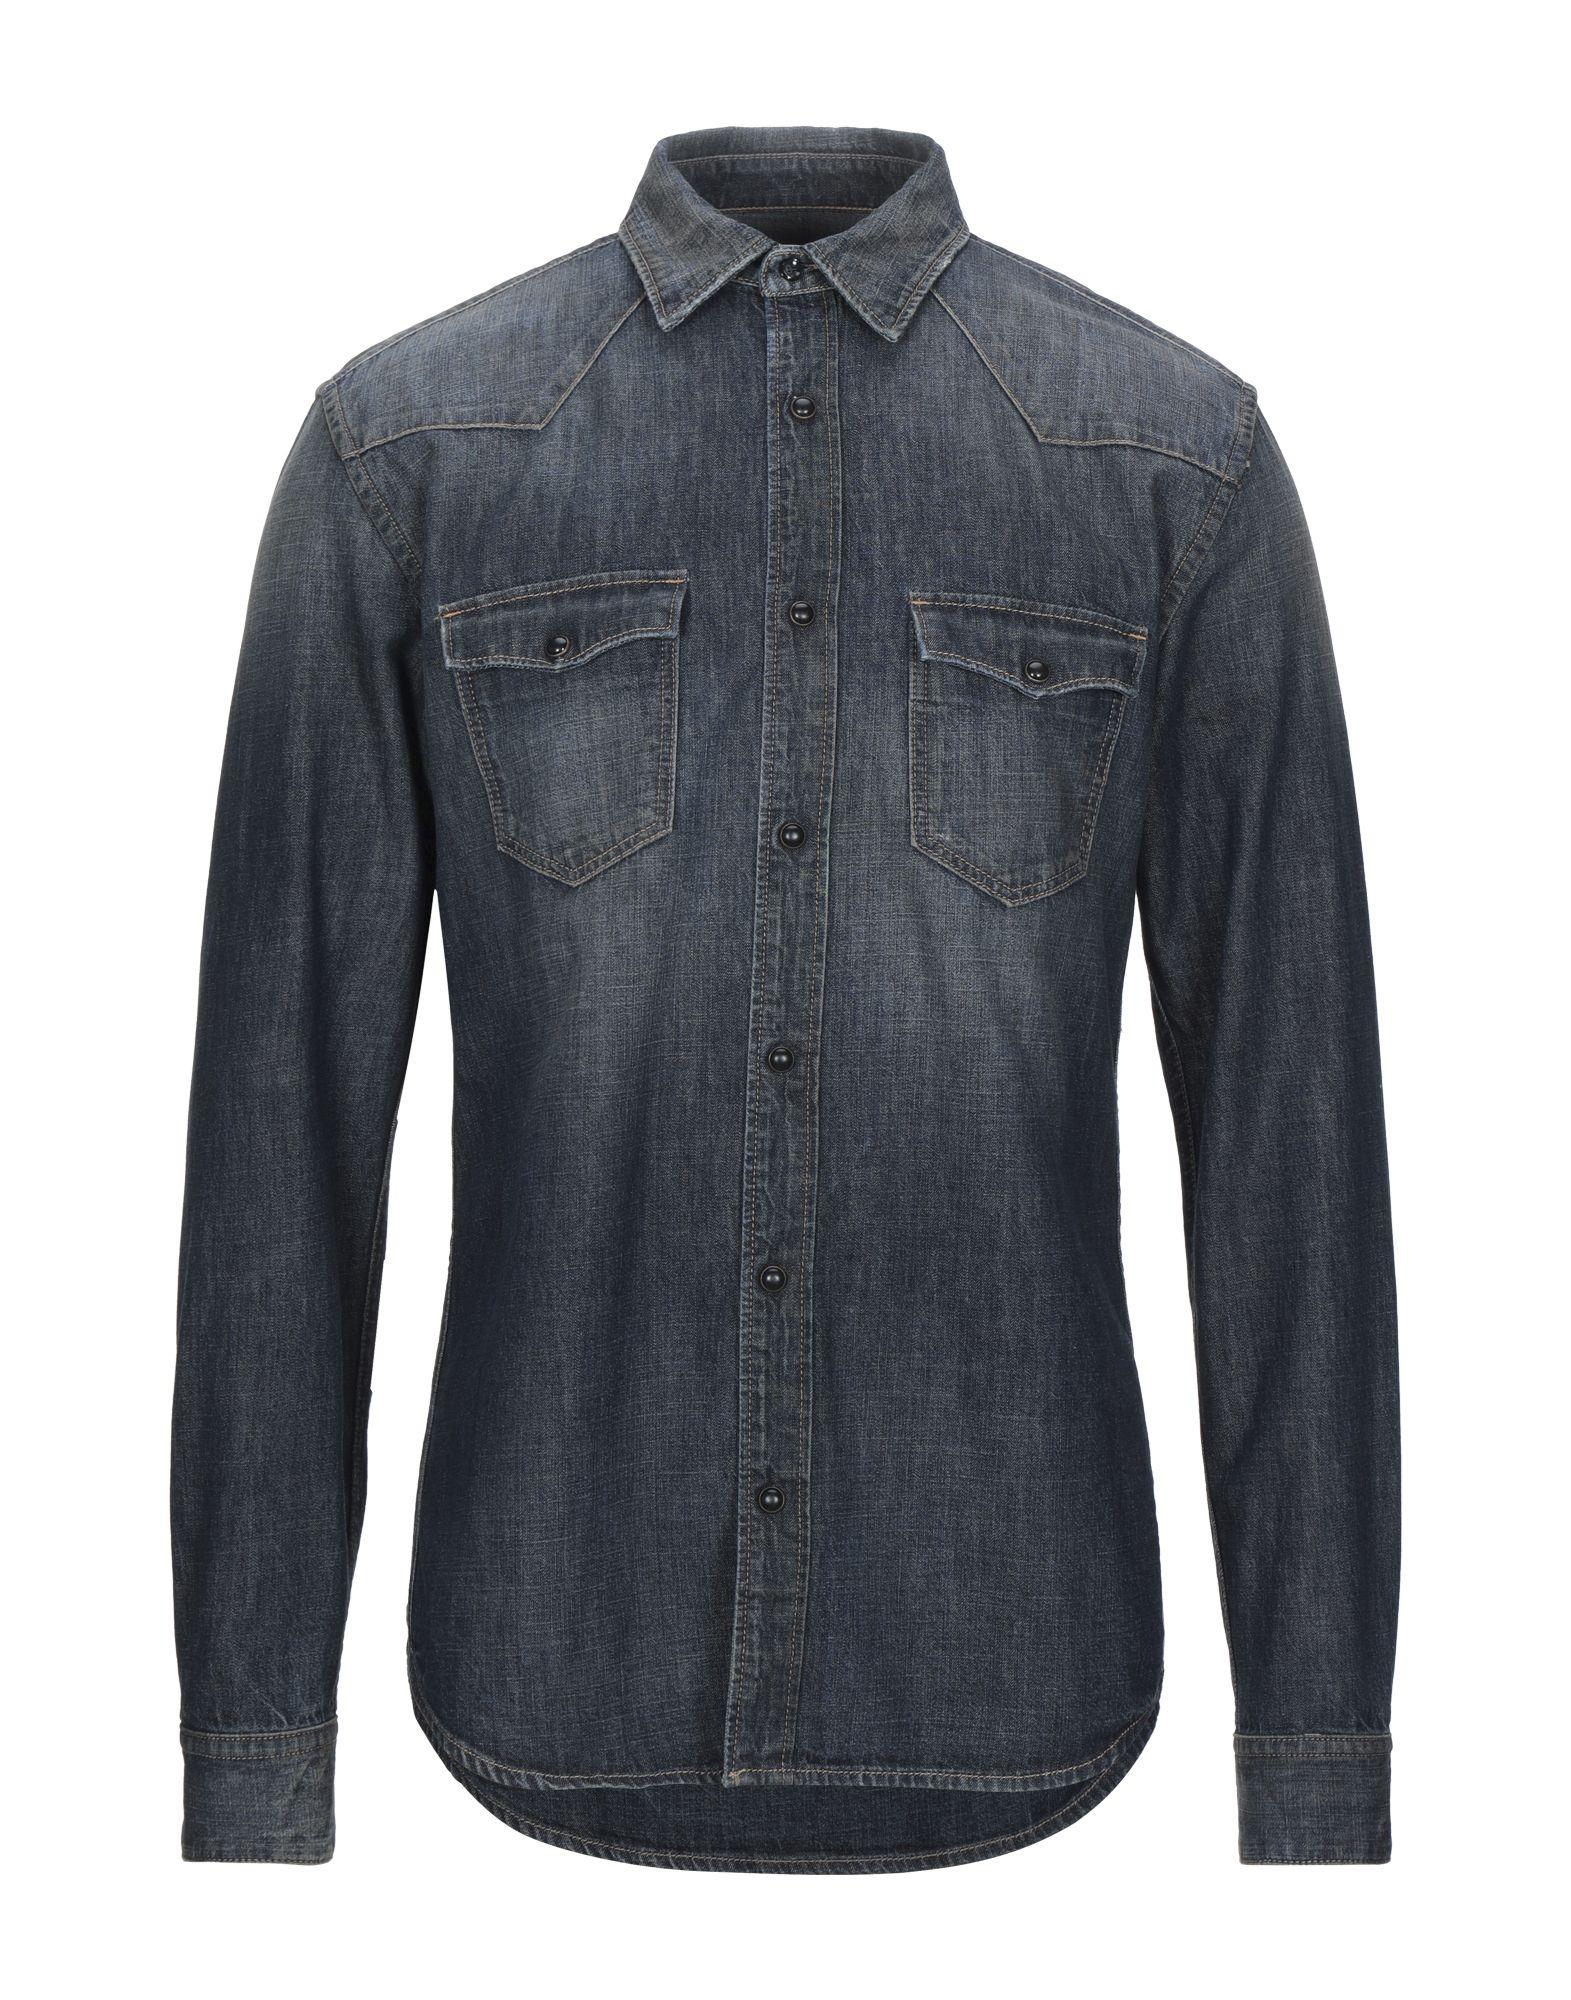 Camicia Di Jeans R.D.D. R.D.D. R.D.D. Royal Denim Division By Jack & Jones uomo - 42581233RL 731